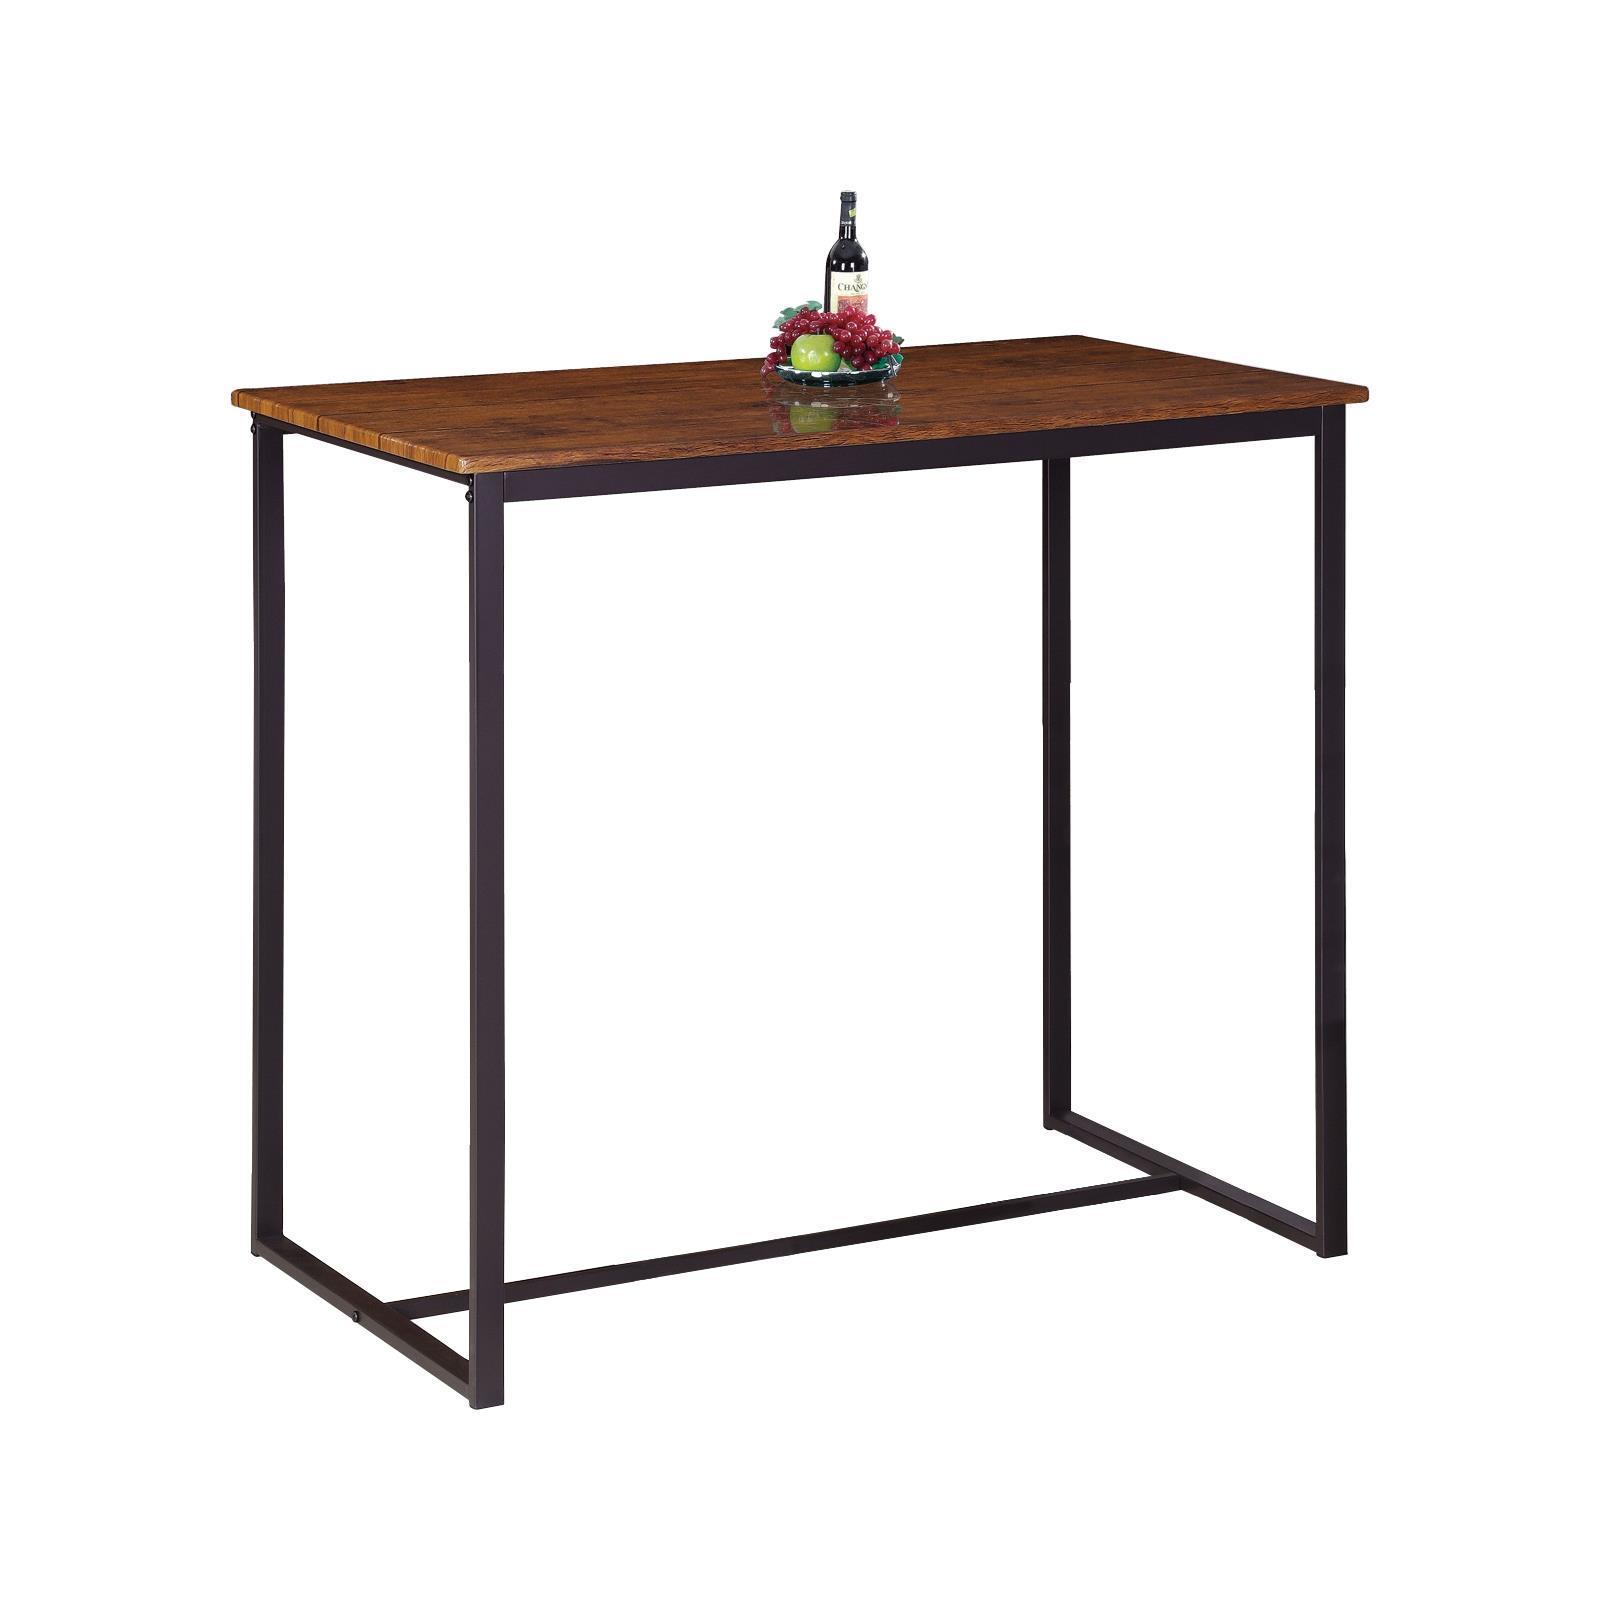 HENRY τραπέζι bar καρυδί με σκ. καφέ σκελετό Υ86x100x60εκ.